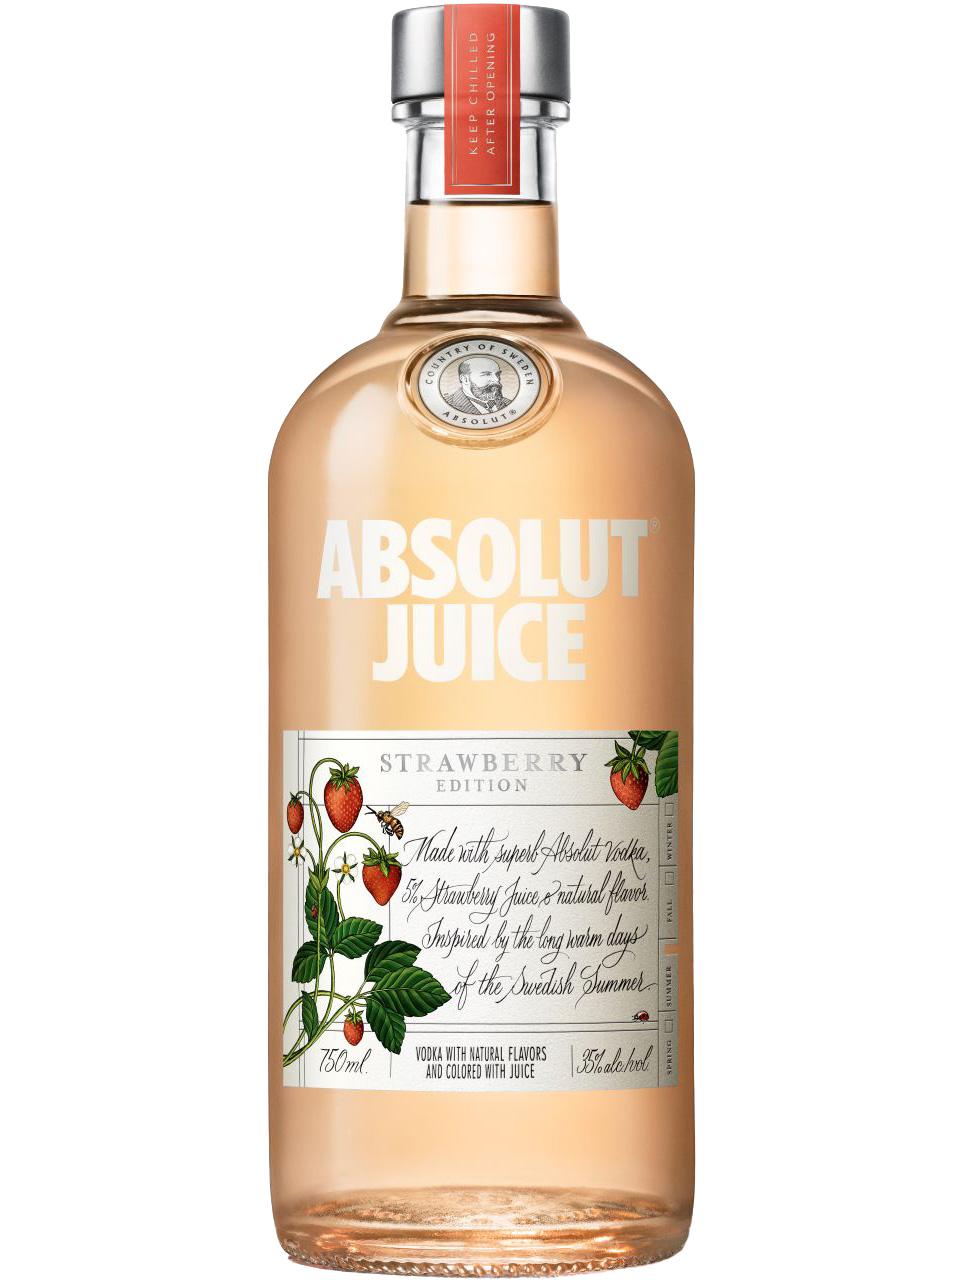 Absolut Juice Strawberry Edition Vodka